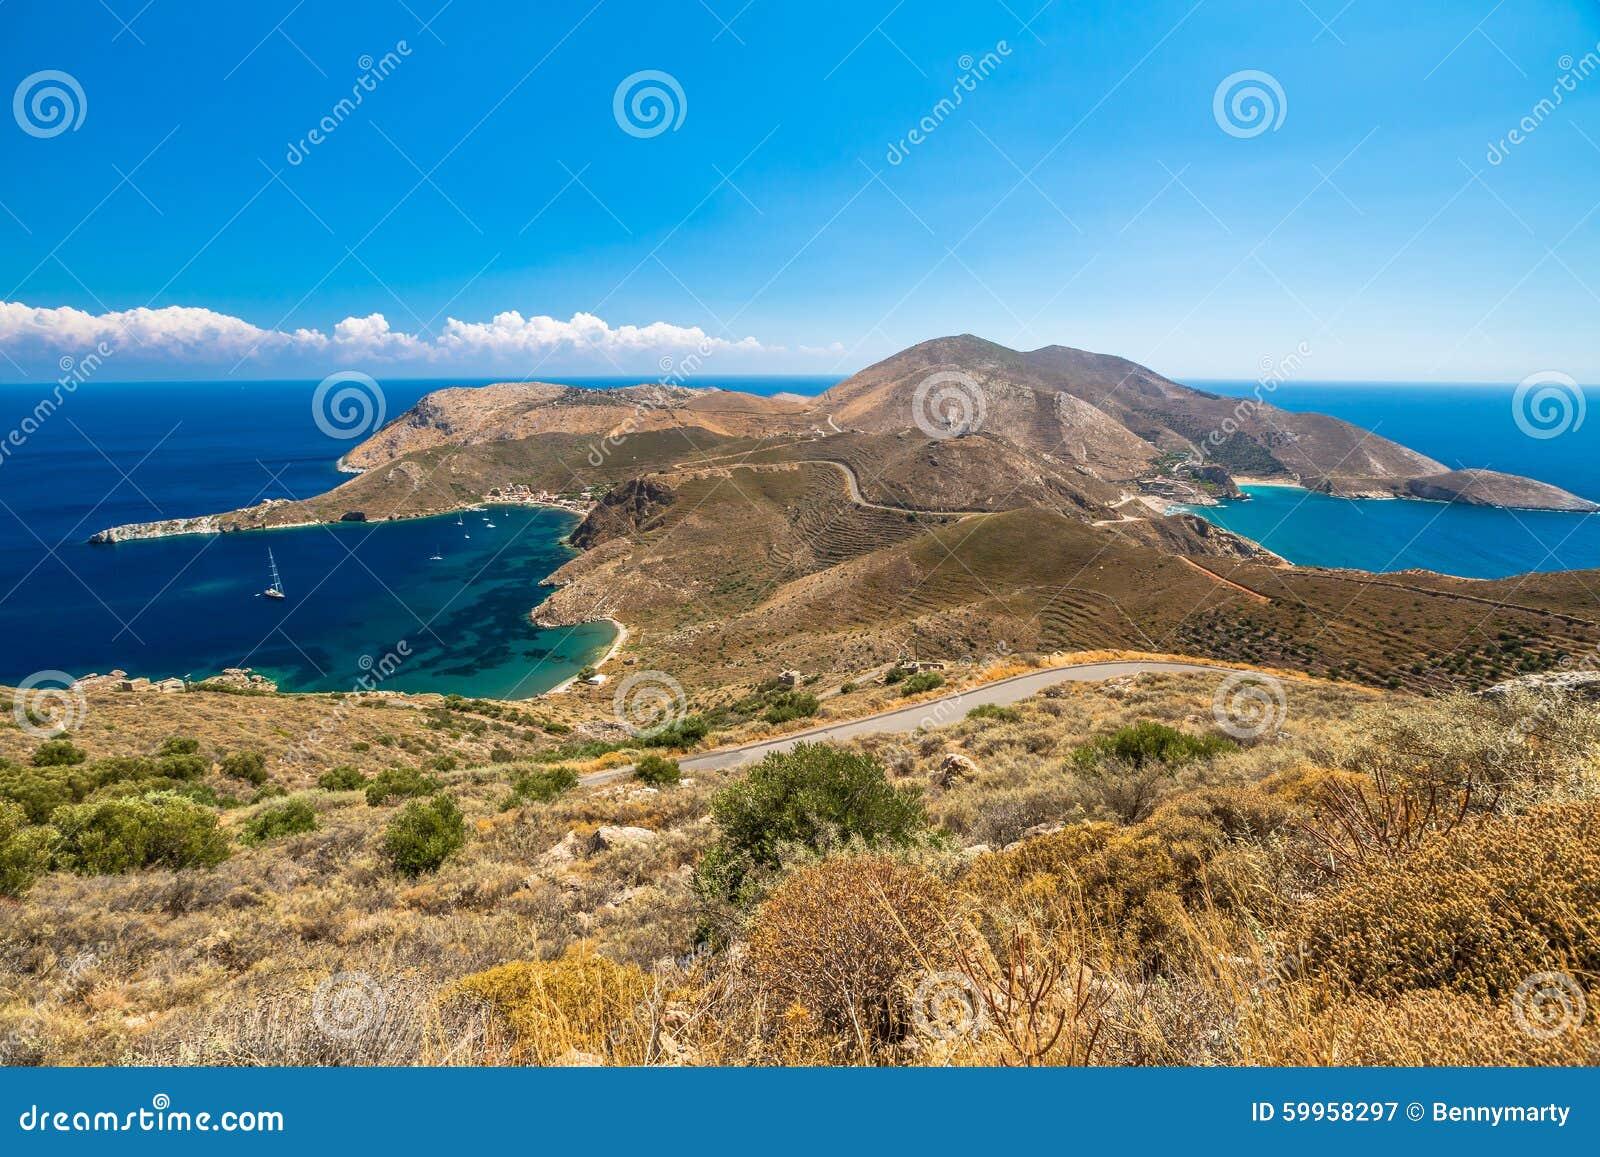 Mani Beaches Greece